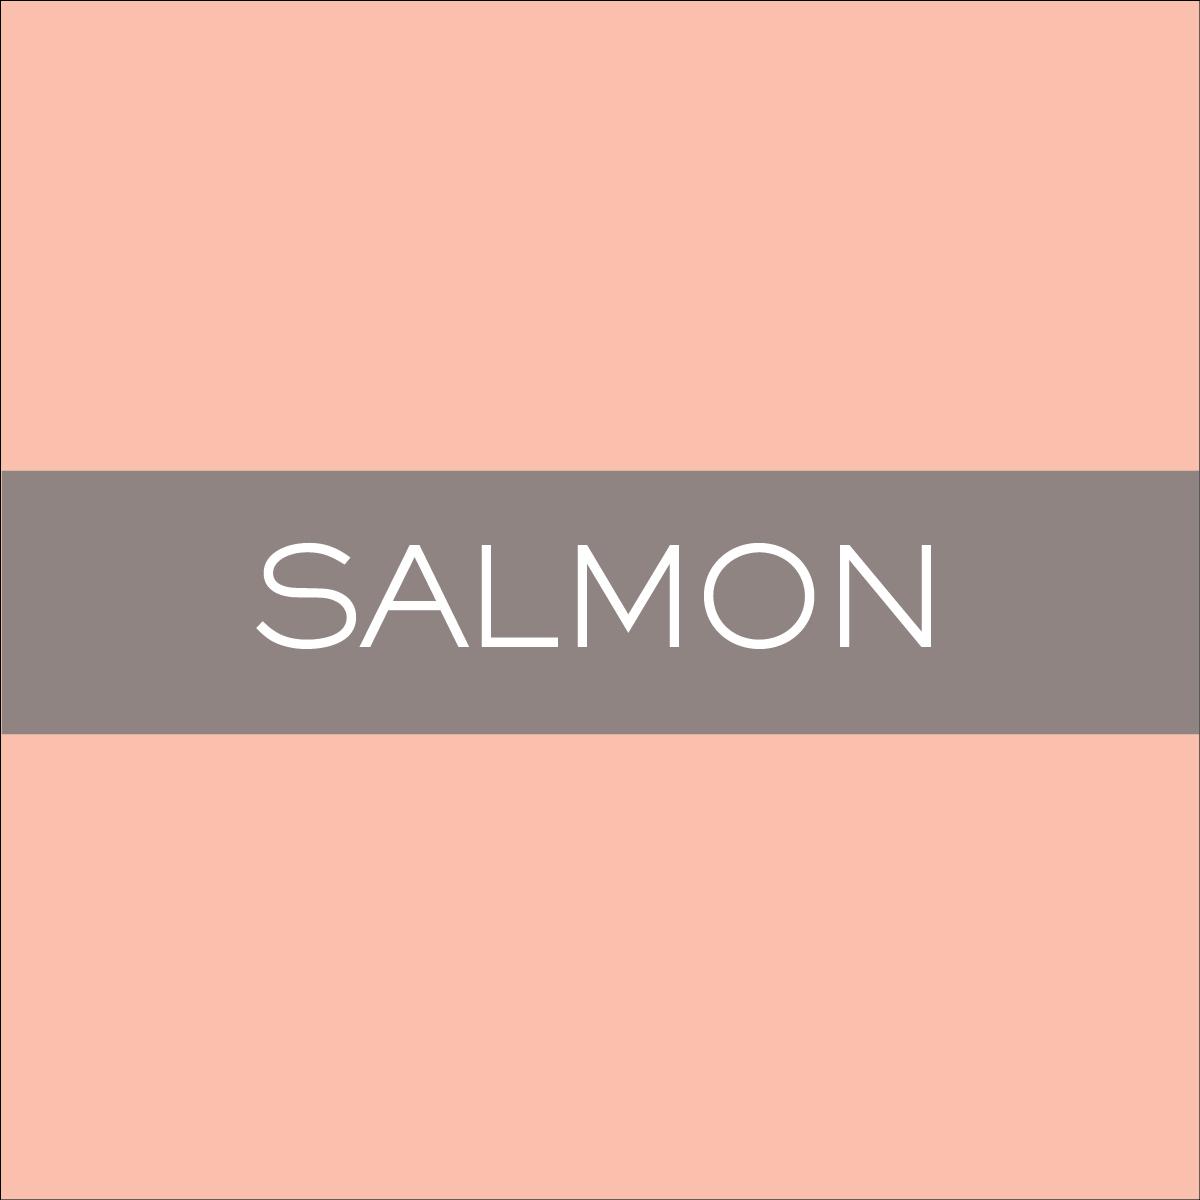 INK_Salmon.jpg